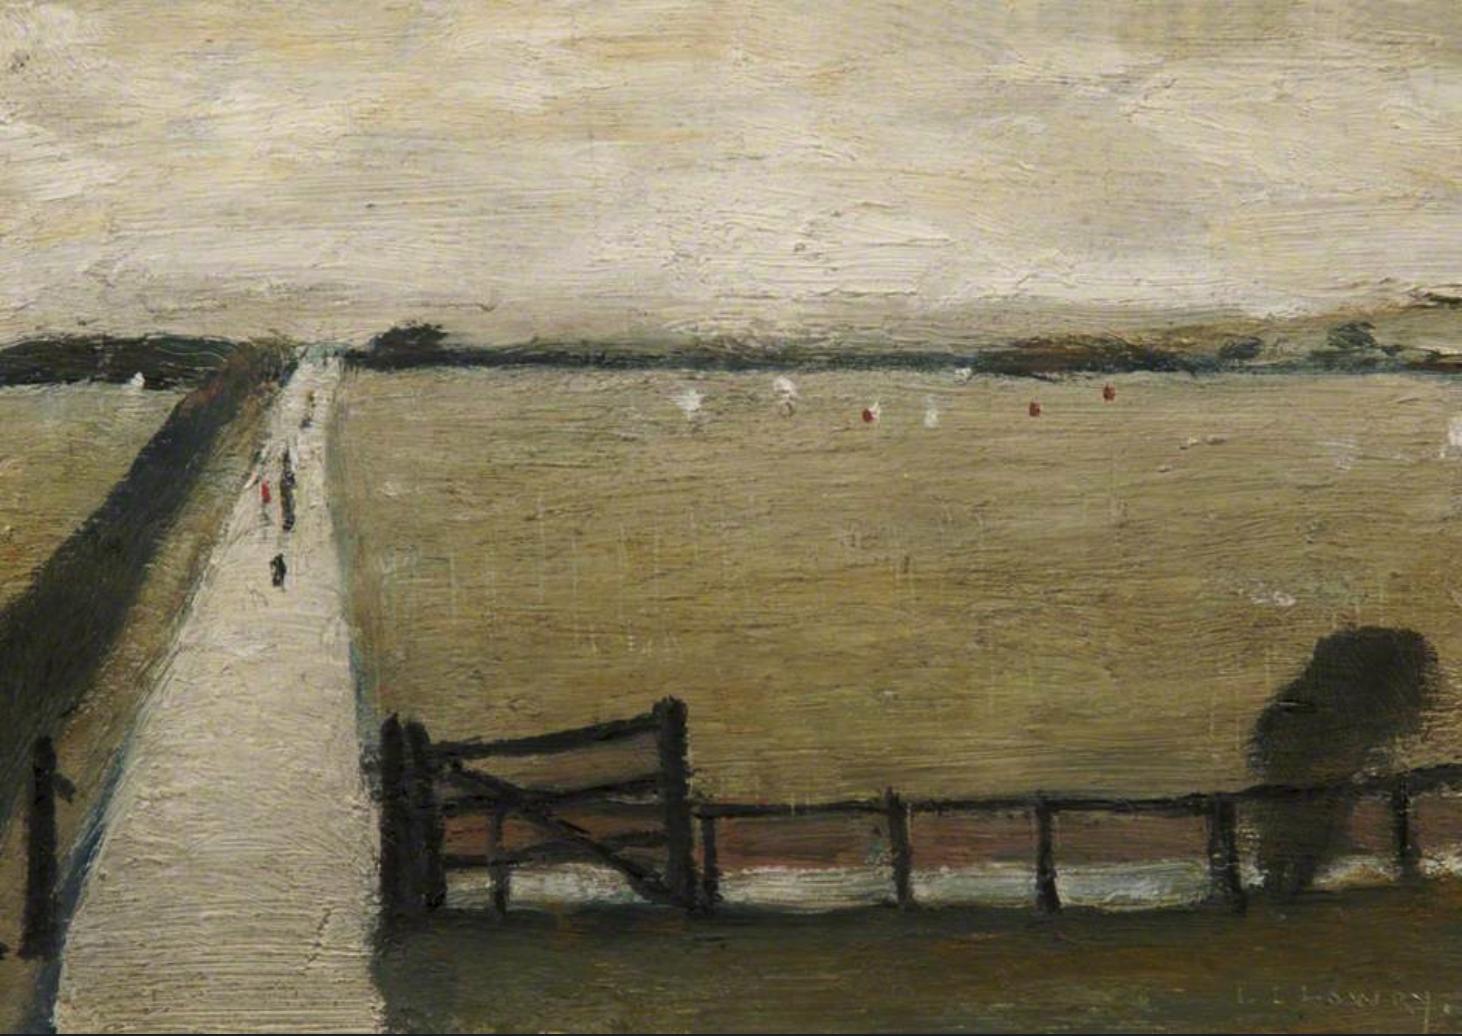 Swinton Mos (1922) by Laurence Stephen Lowry (1887 - 1976), English artist.